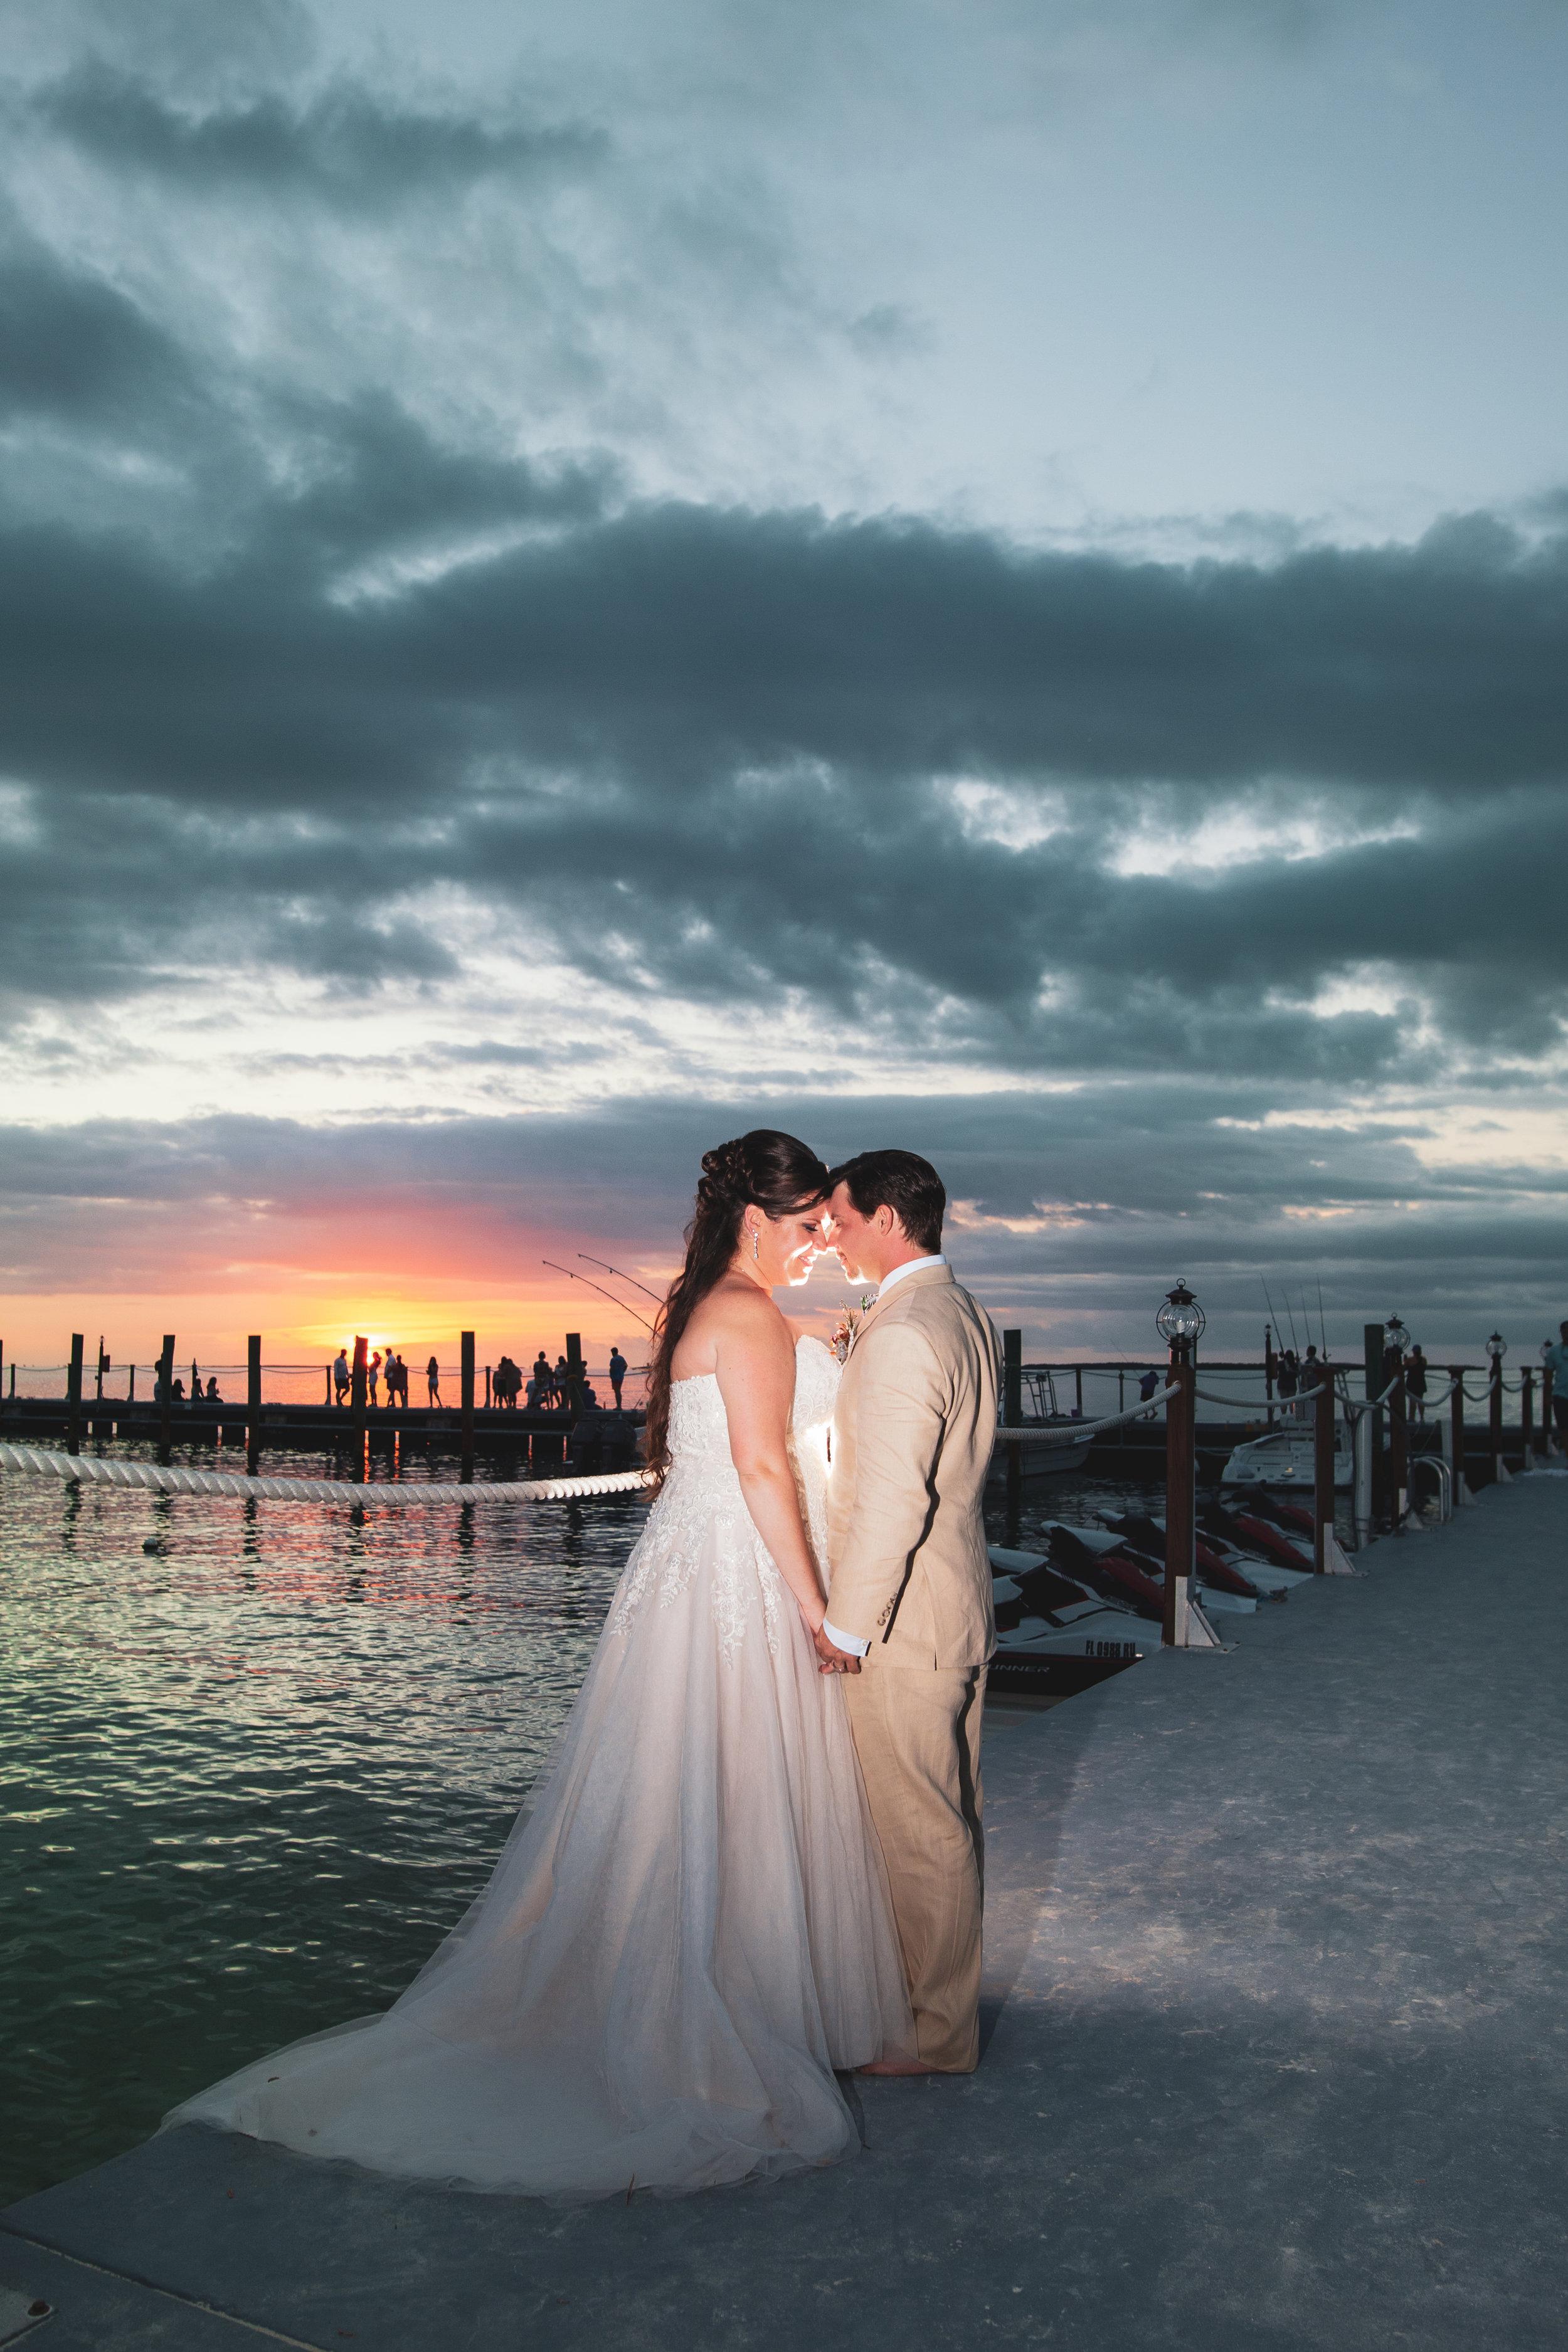 key largo florida beach wedding © kelilina photography 20190316182845-1.jpg